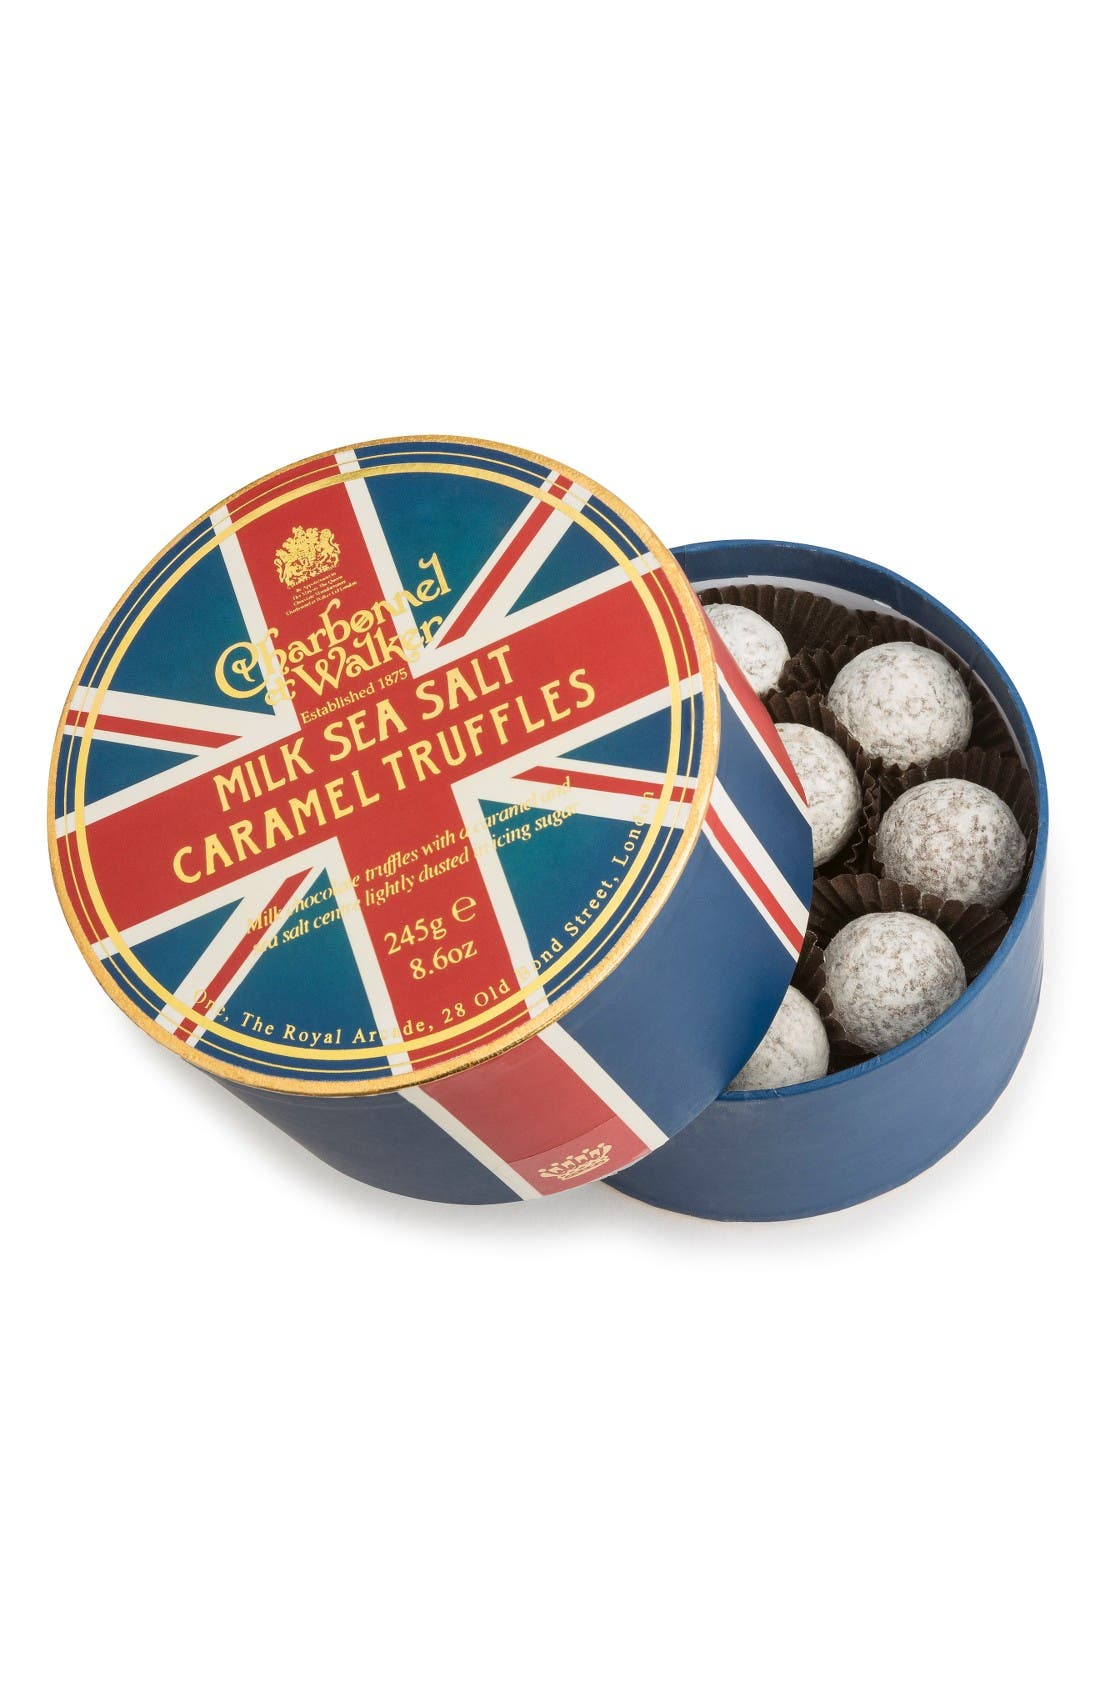 Charbonnel et Walker Sea Salt Milk Chocolate Truffles in Union Flag Gift Box